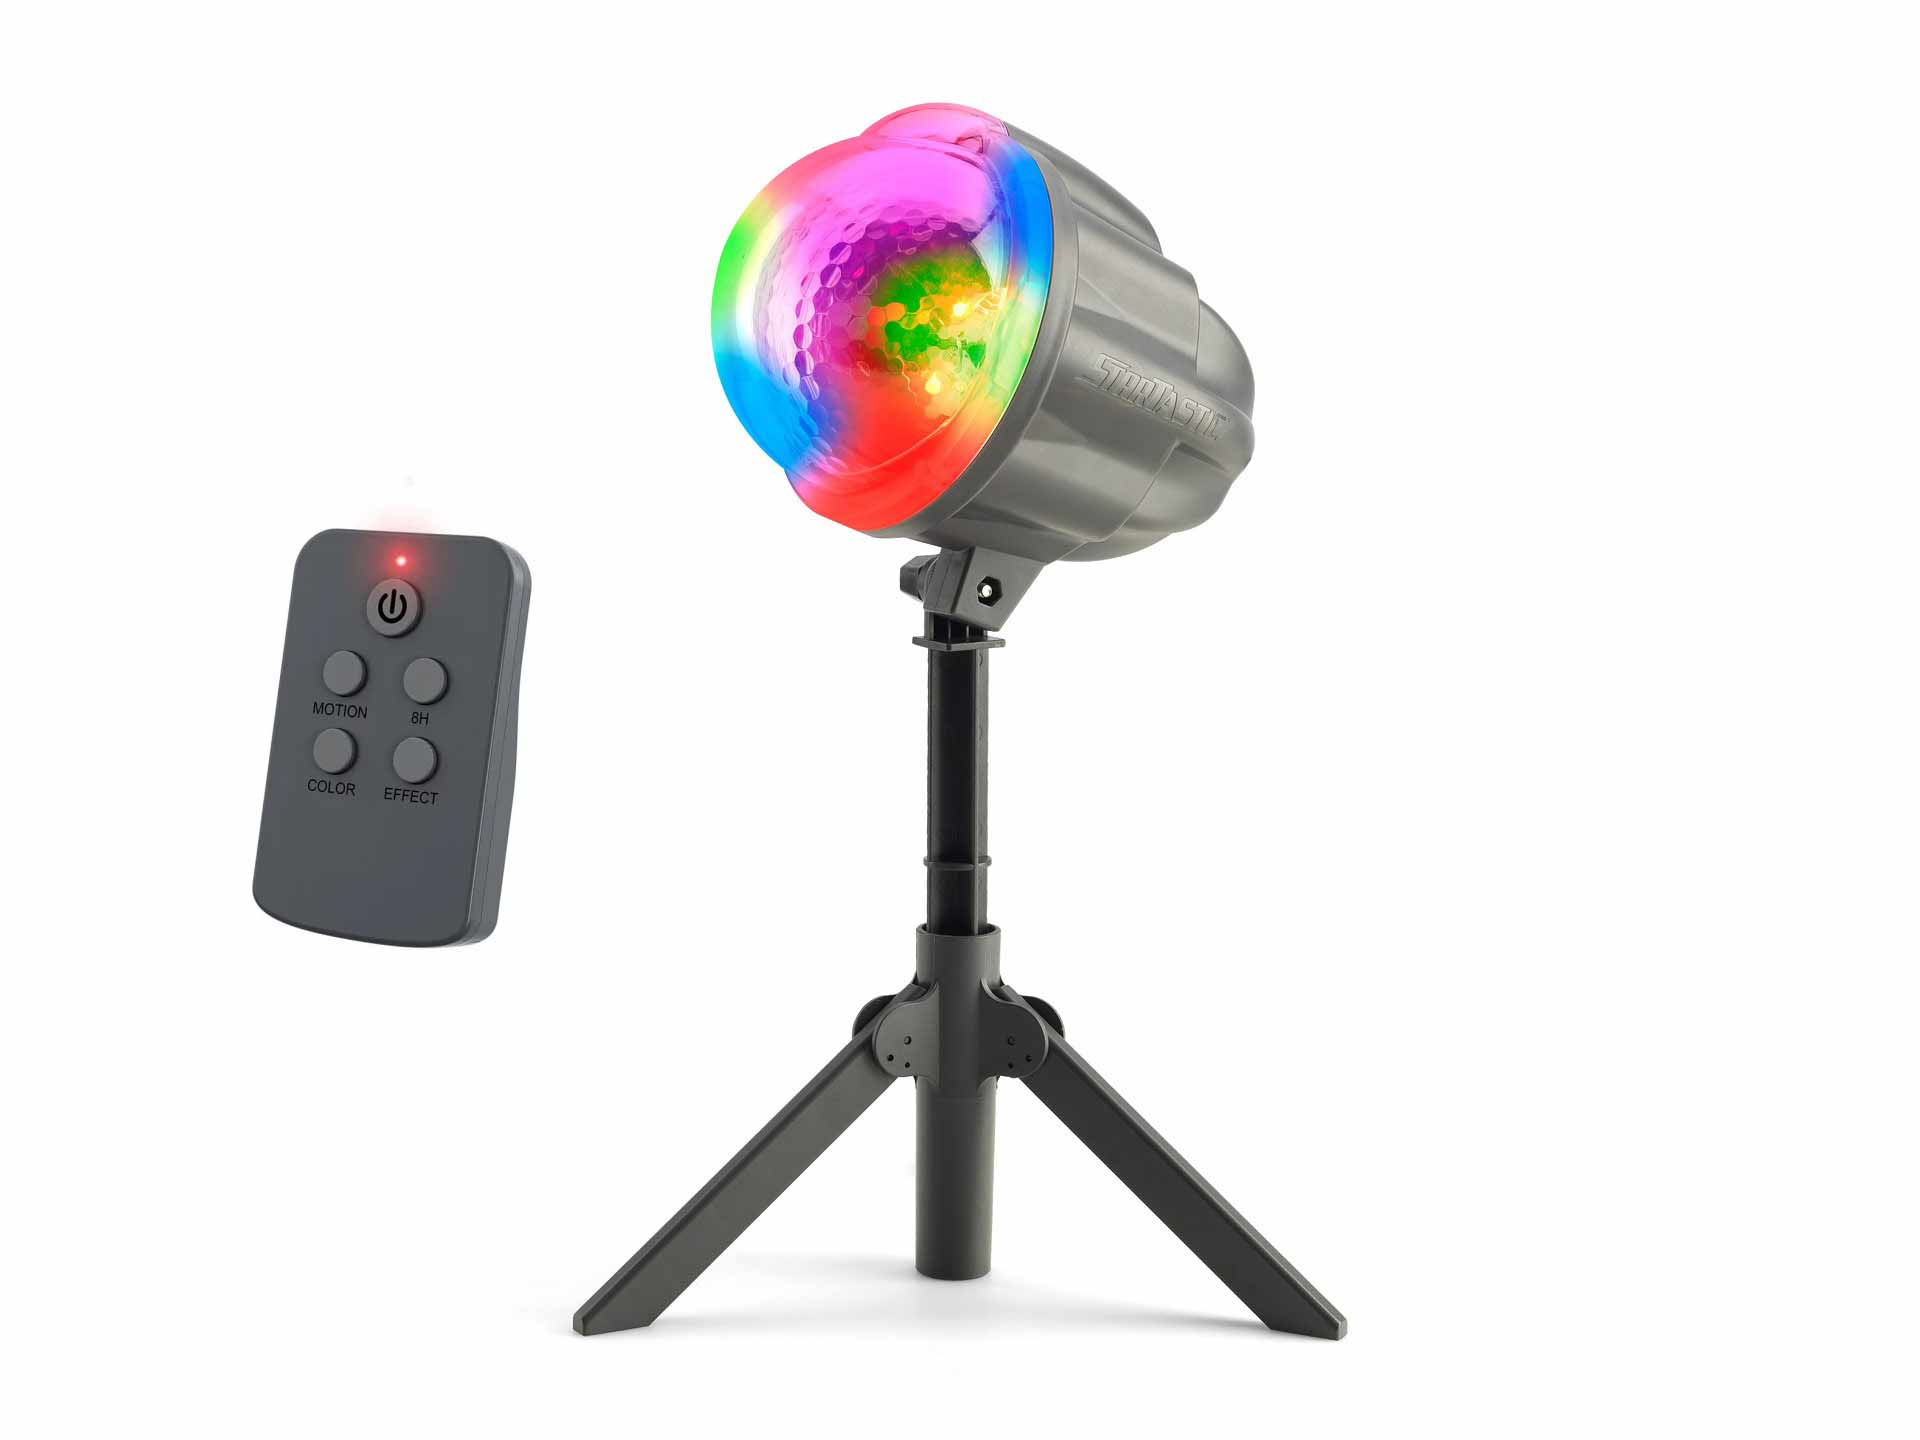 Reflektor StarTastic Max opinie